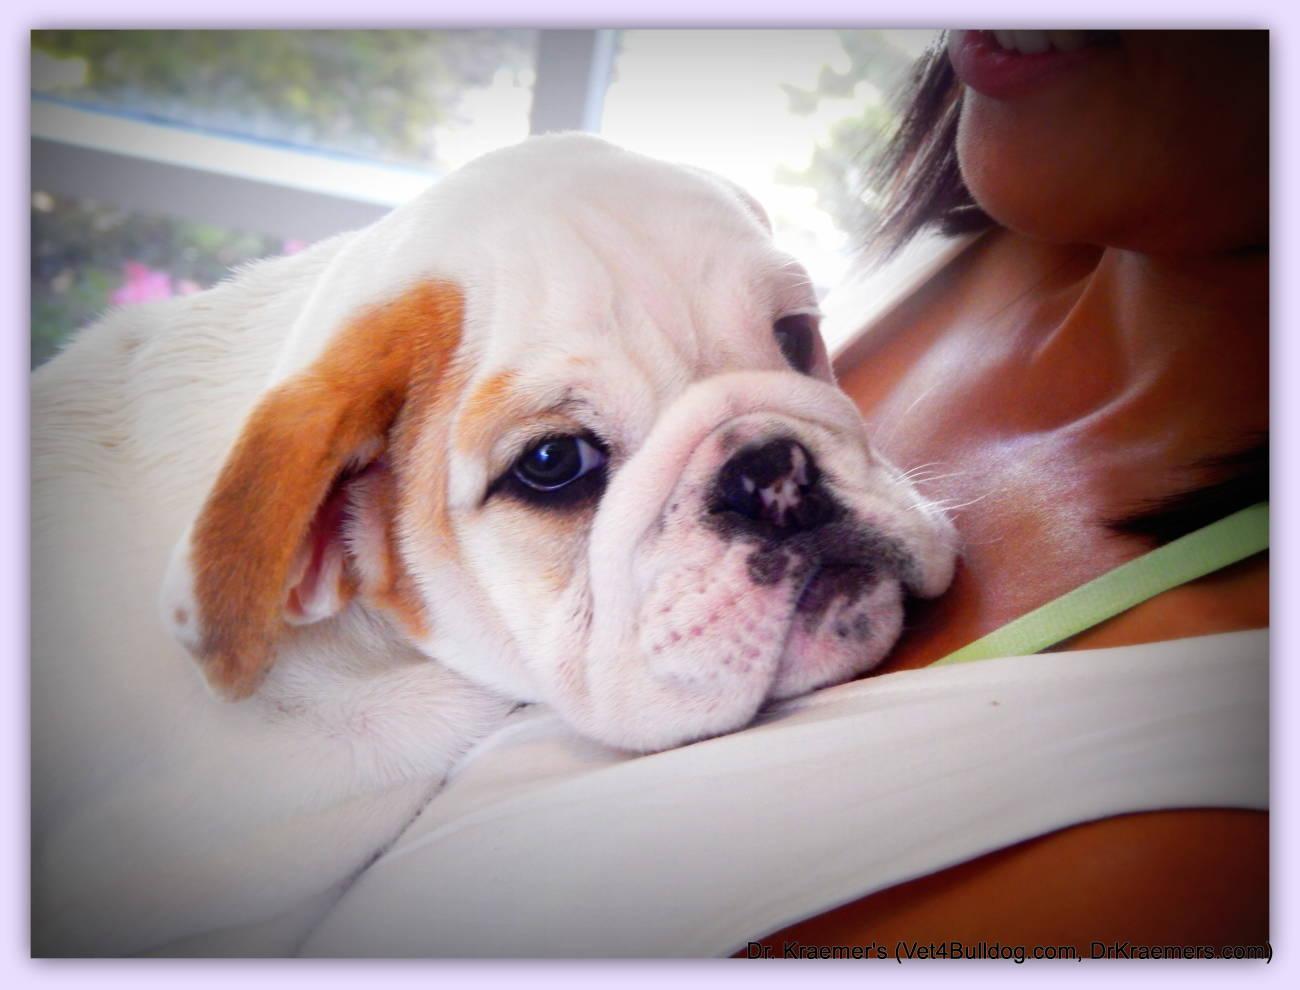 English Bulldog And The English Bulldog Puppy Are Most Popular